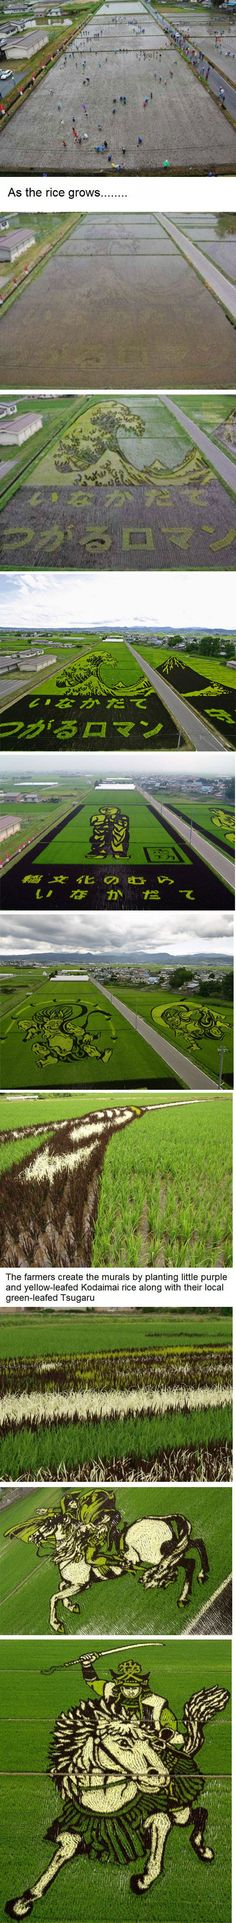 Creative Japan rice fields drawings